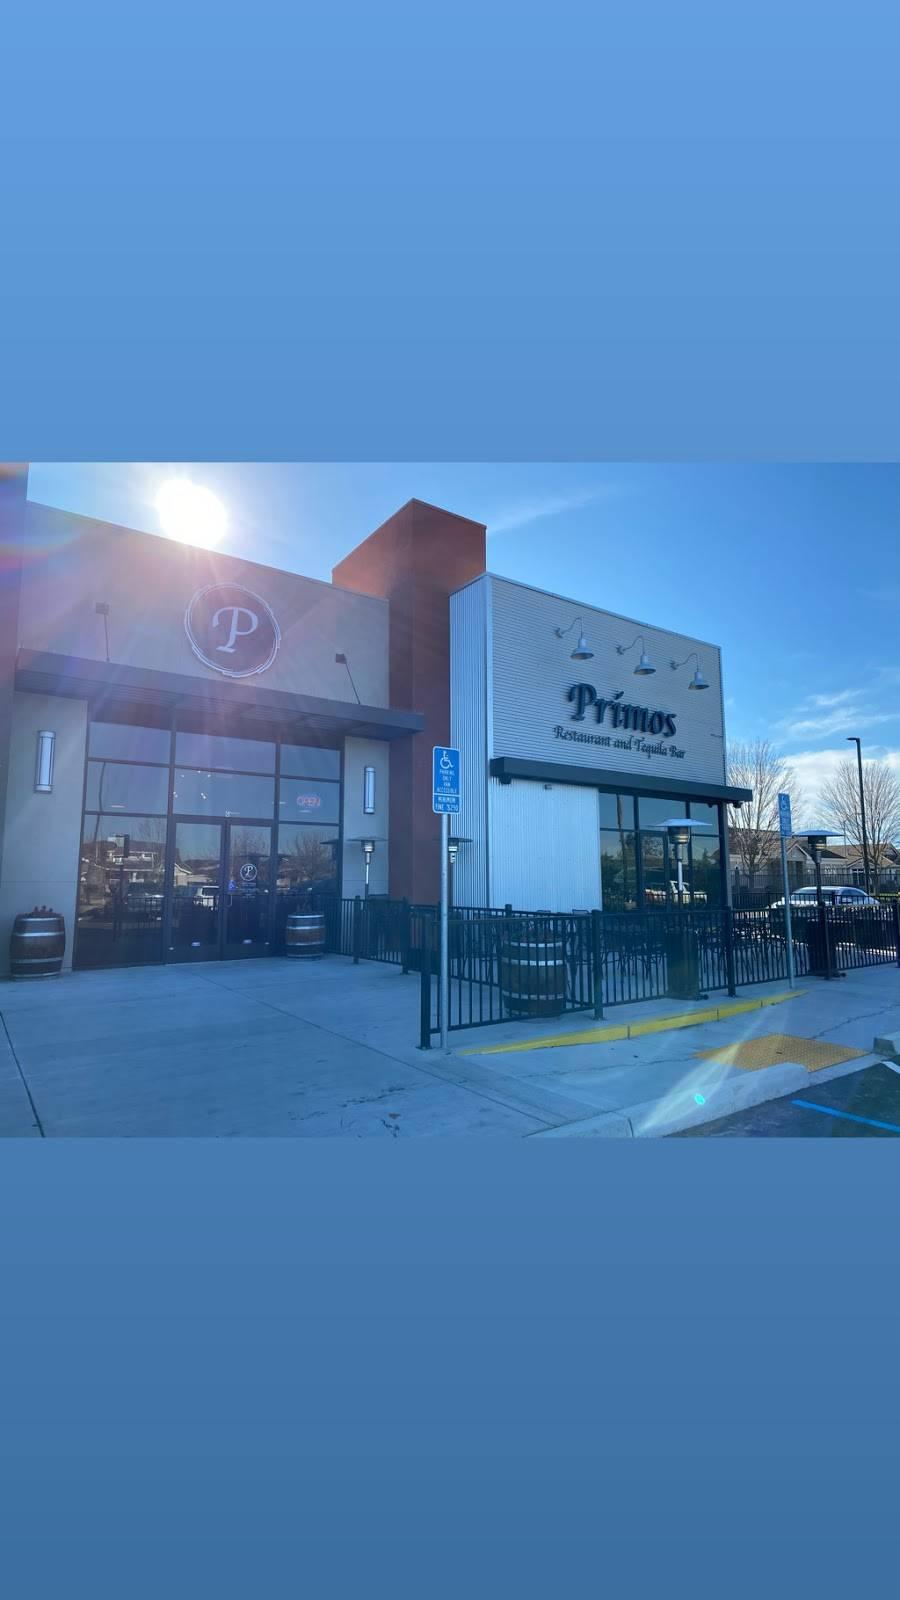 Ripon Terrazza Shopping Center | restaurant | 222 W River Rd Suite G, Ripon, CA 95366, USA | 2092356233 OR +1 209-235-6233